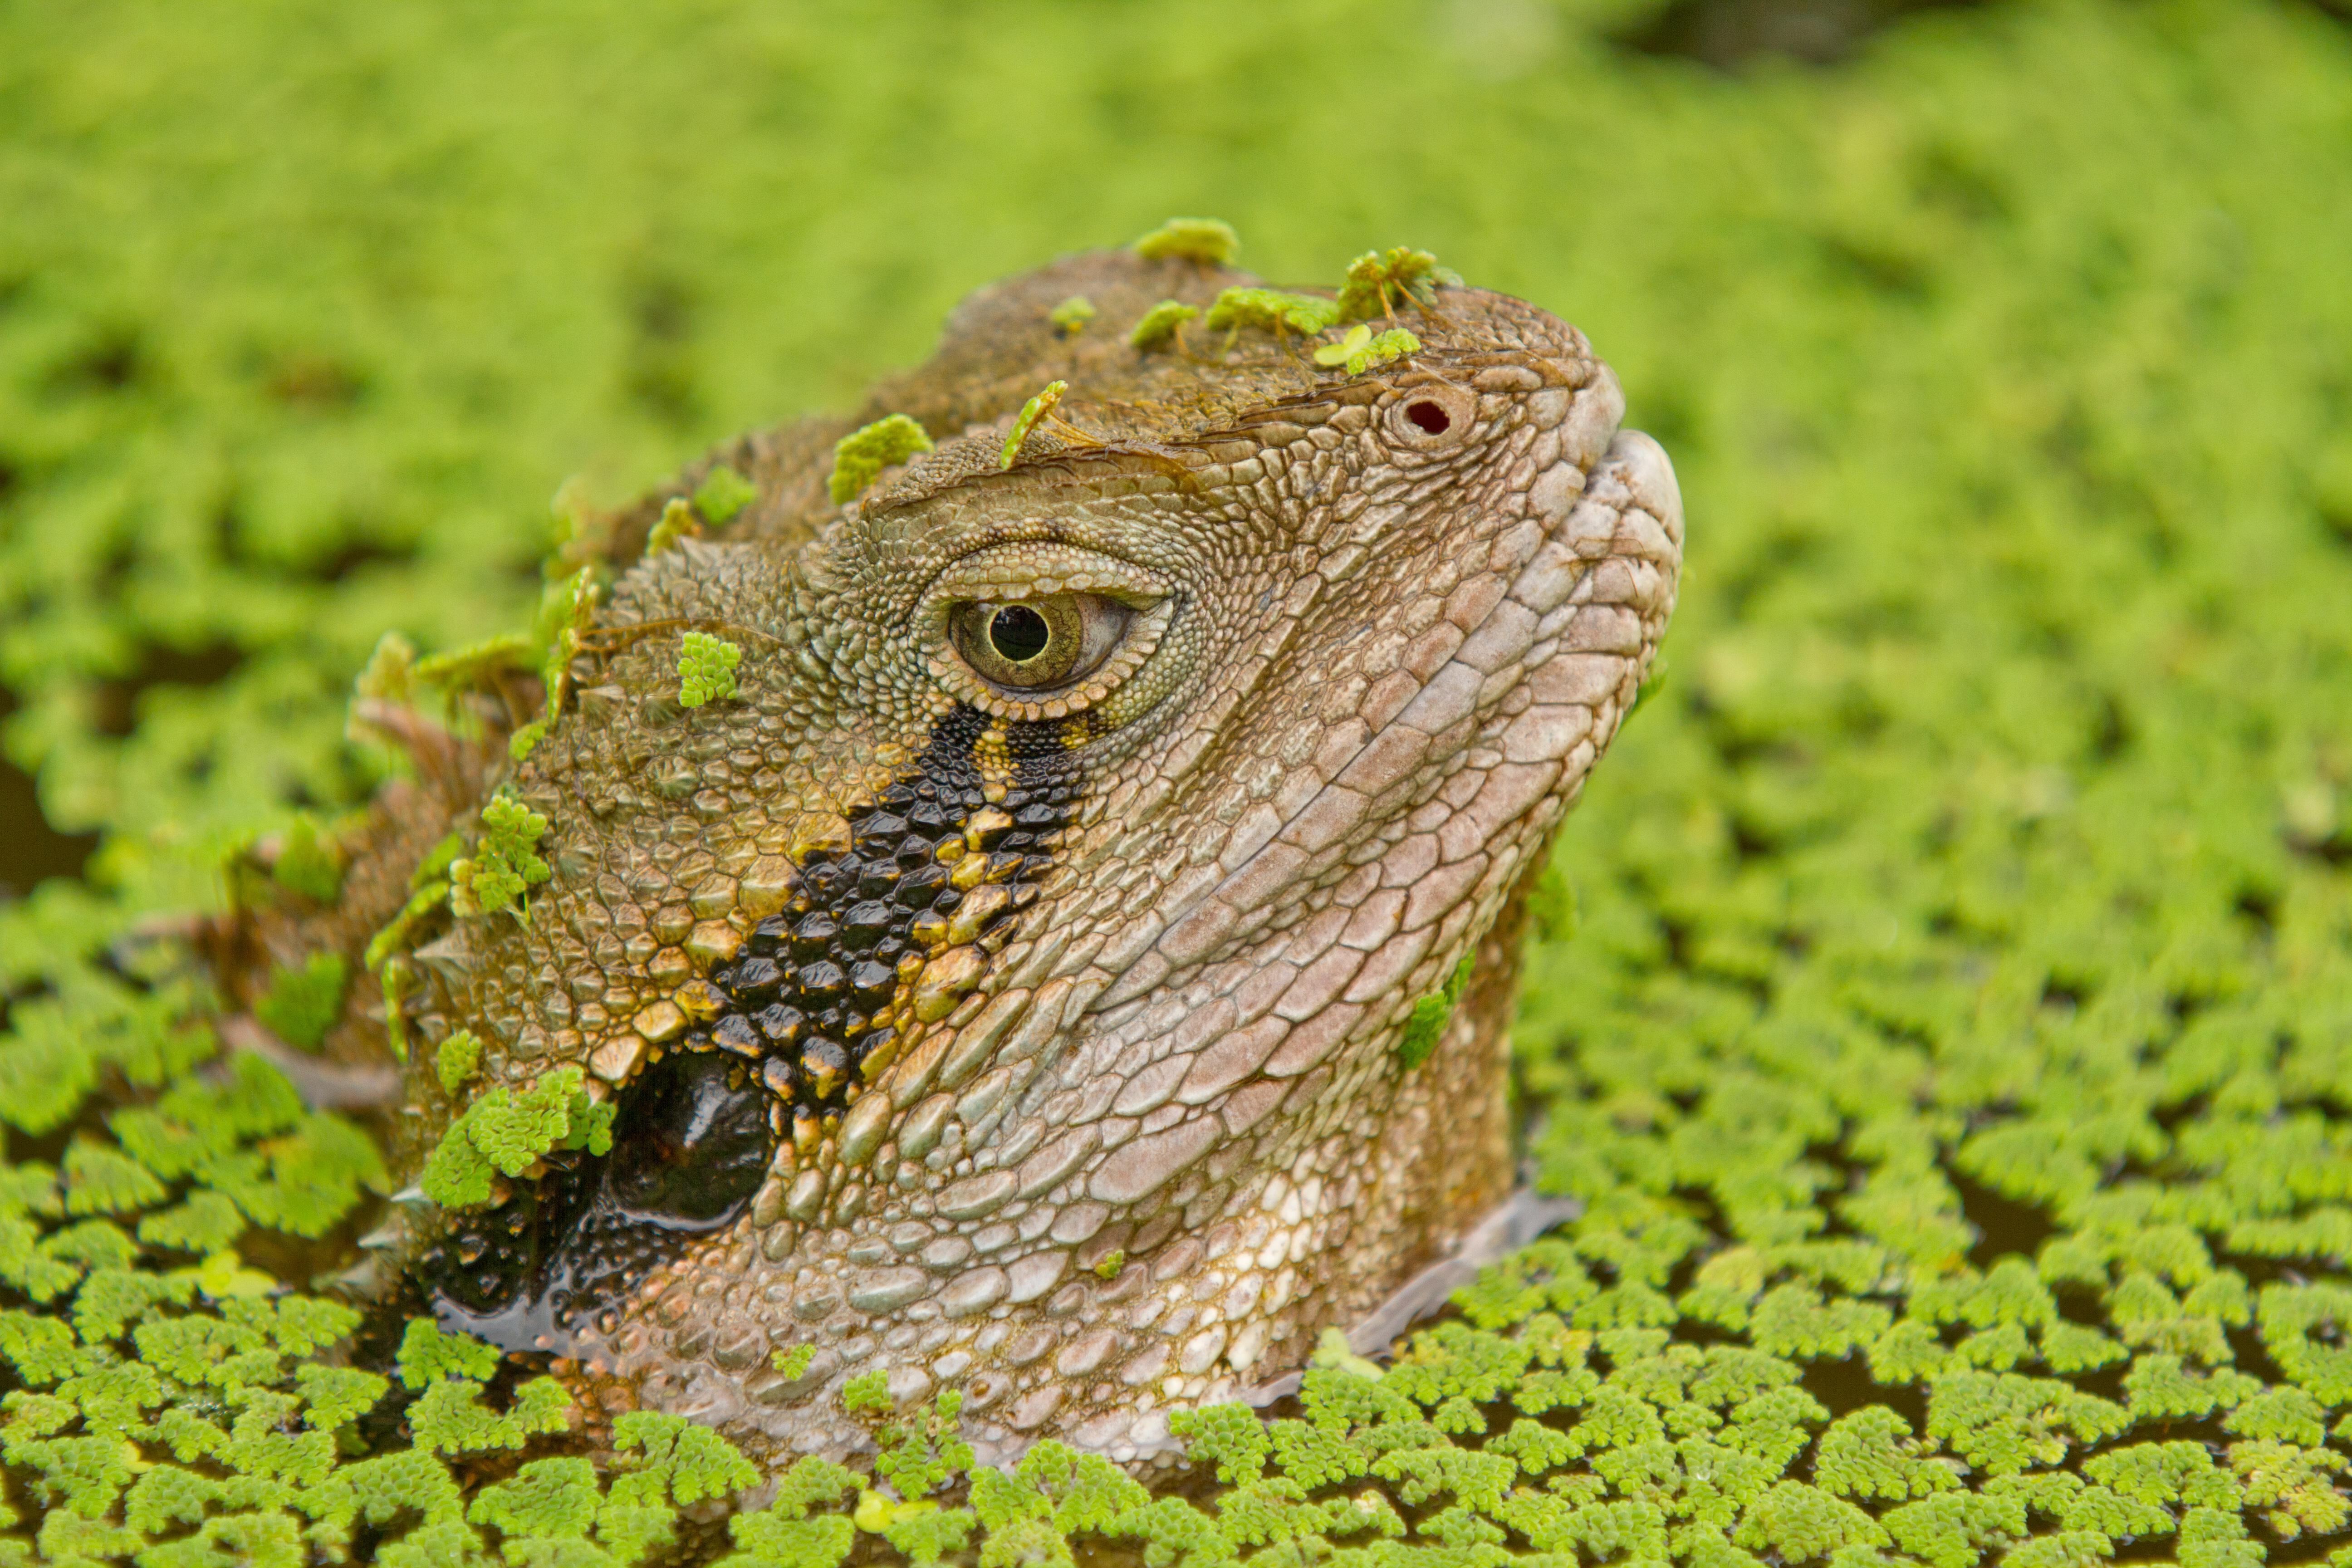 Australian Water Dragon: File:AndrewMercerIMG 5585 Australian Water Dragon.jpg